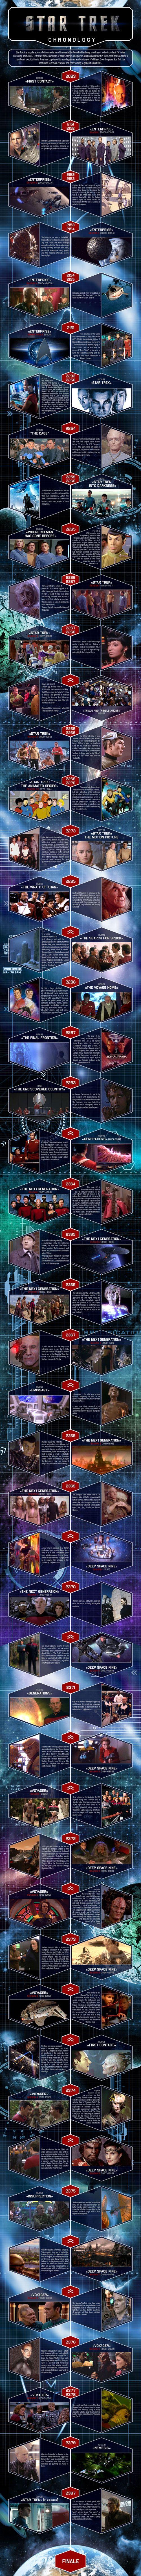 Star Trek Timeline This is wonderful ((except star trek 2009 and into darkness are an alternative timeline))